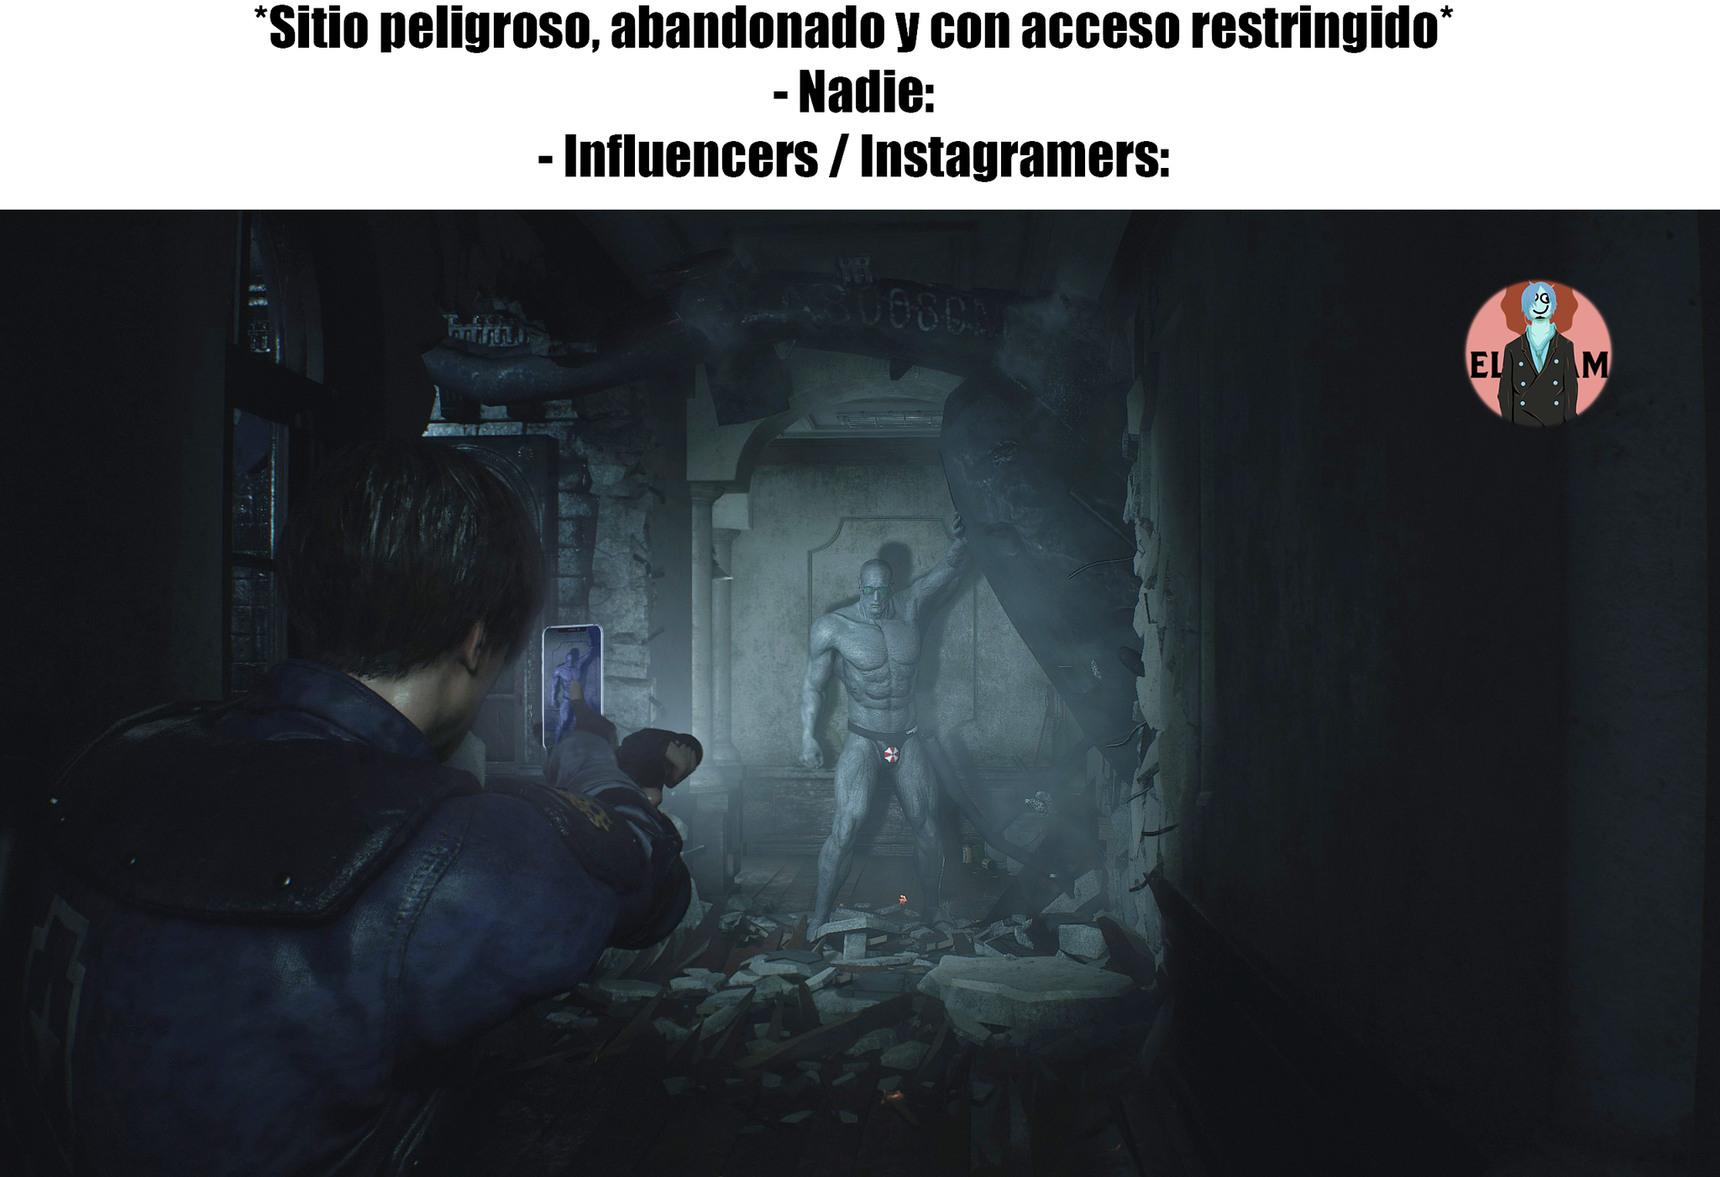 Postureogram - meme